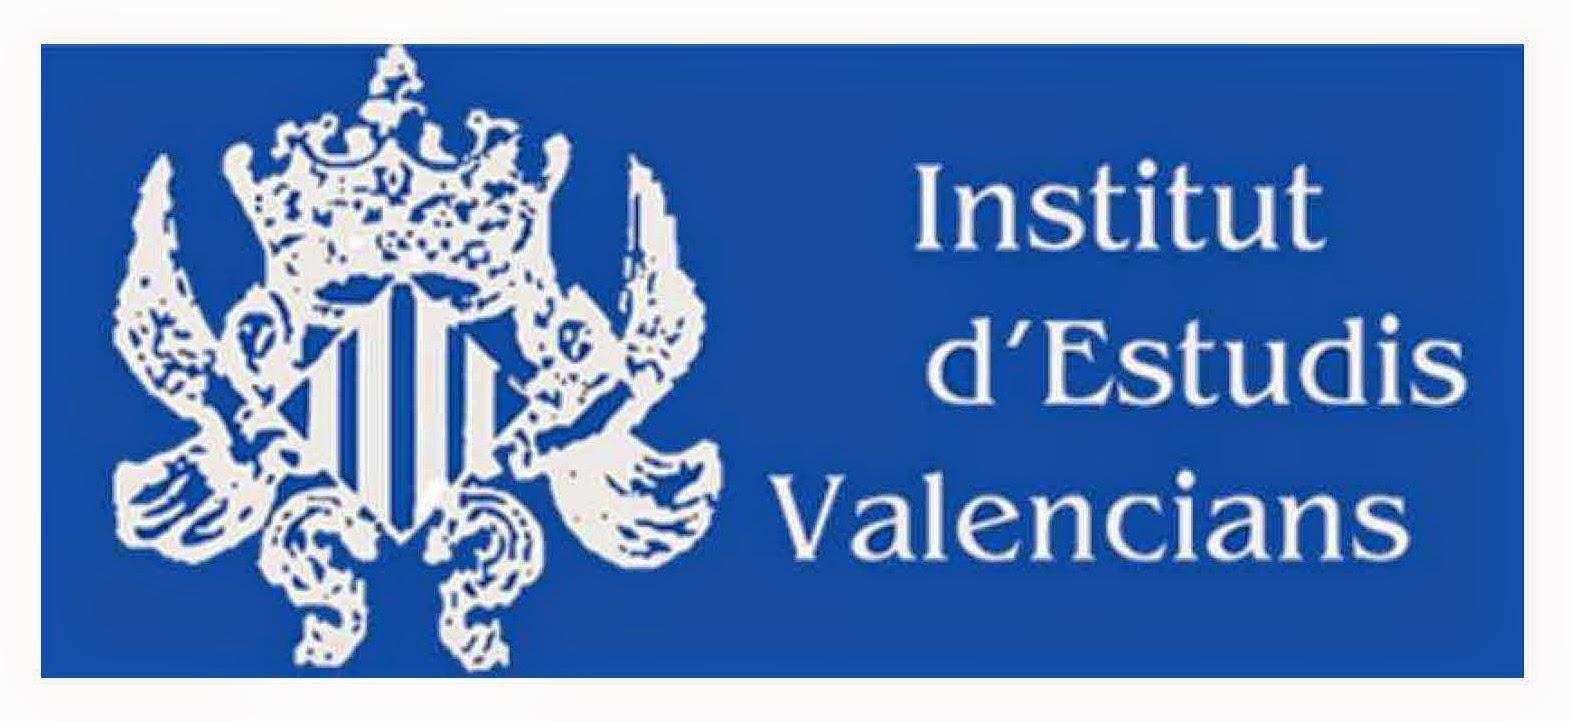 INSTITUT D'ESTUDIS VALENCIANS, CURS 2015